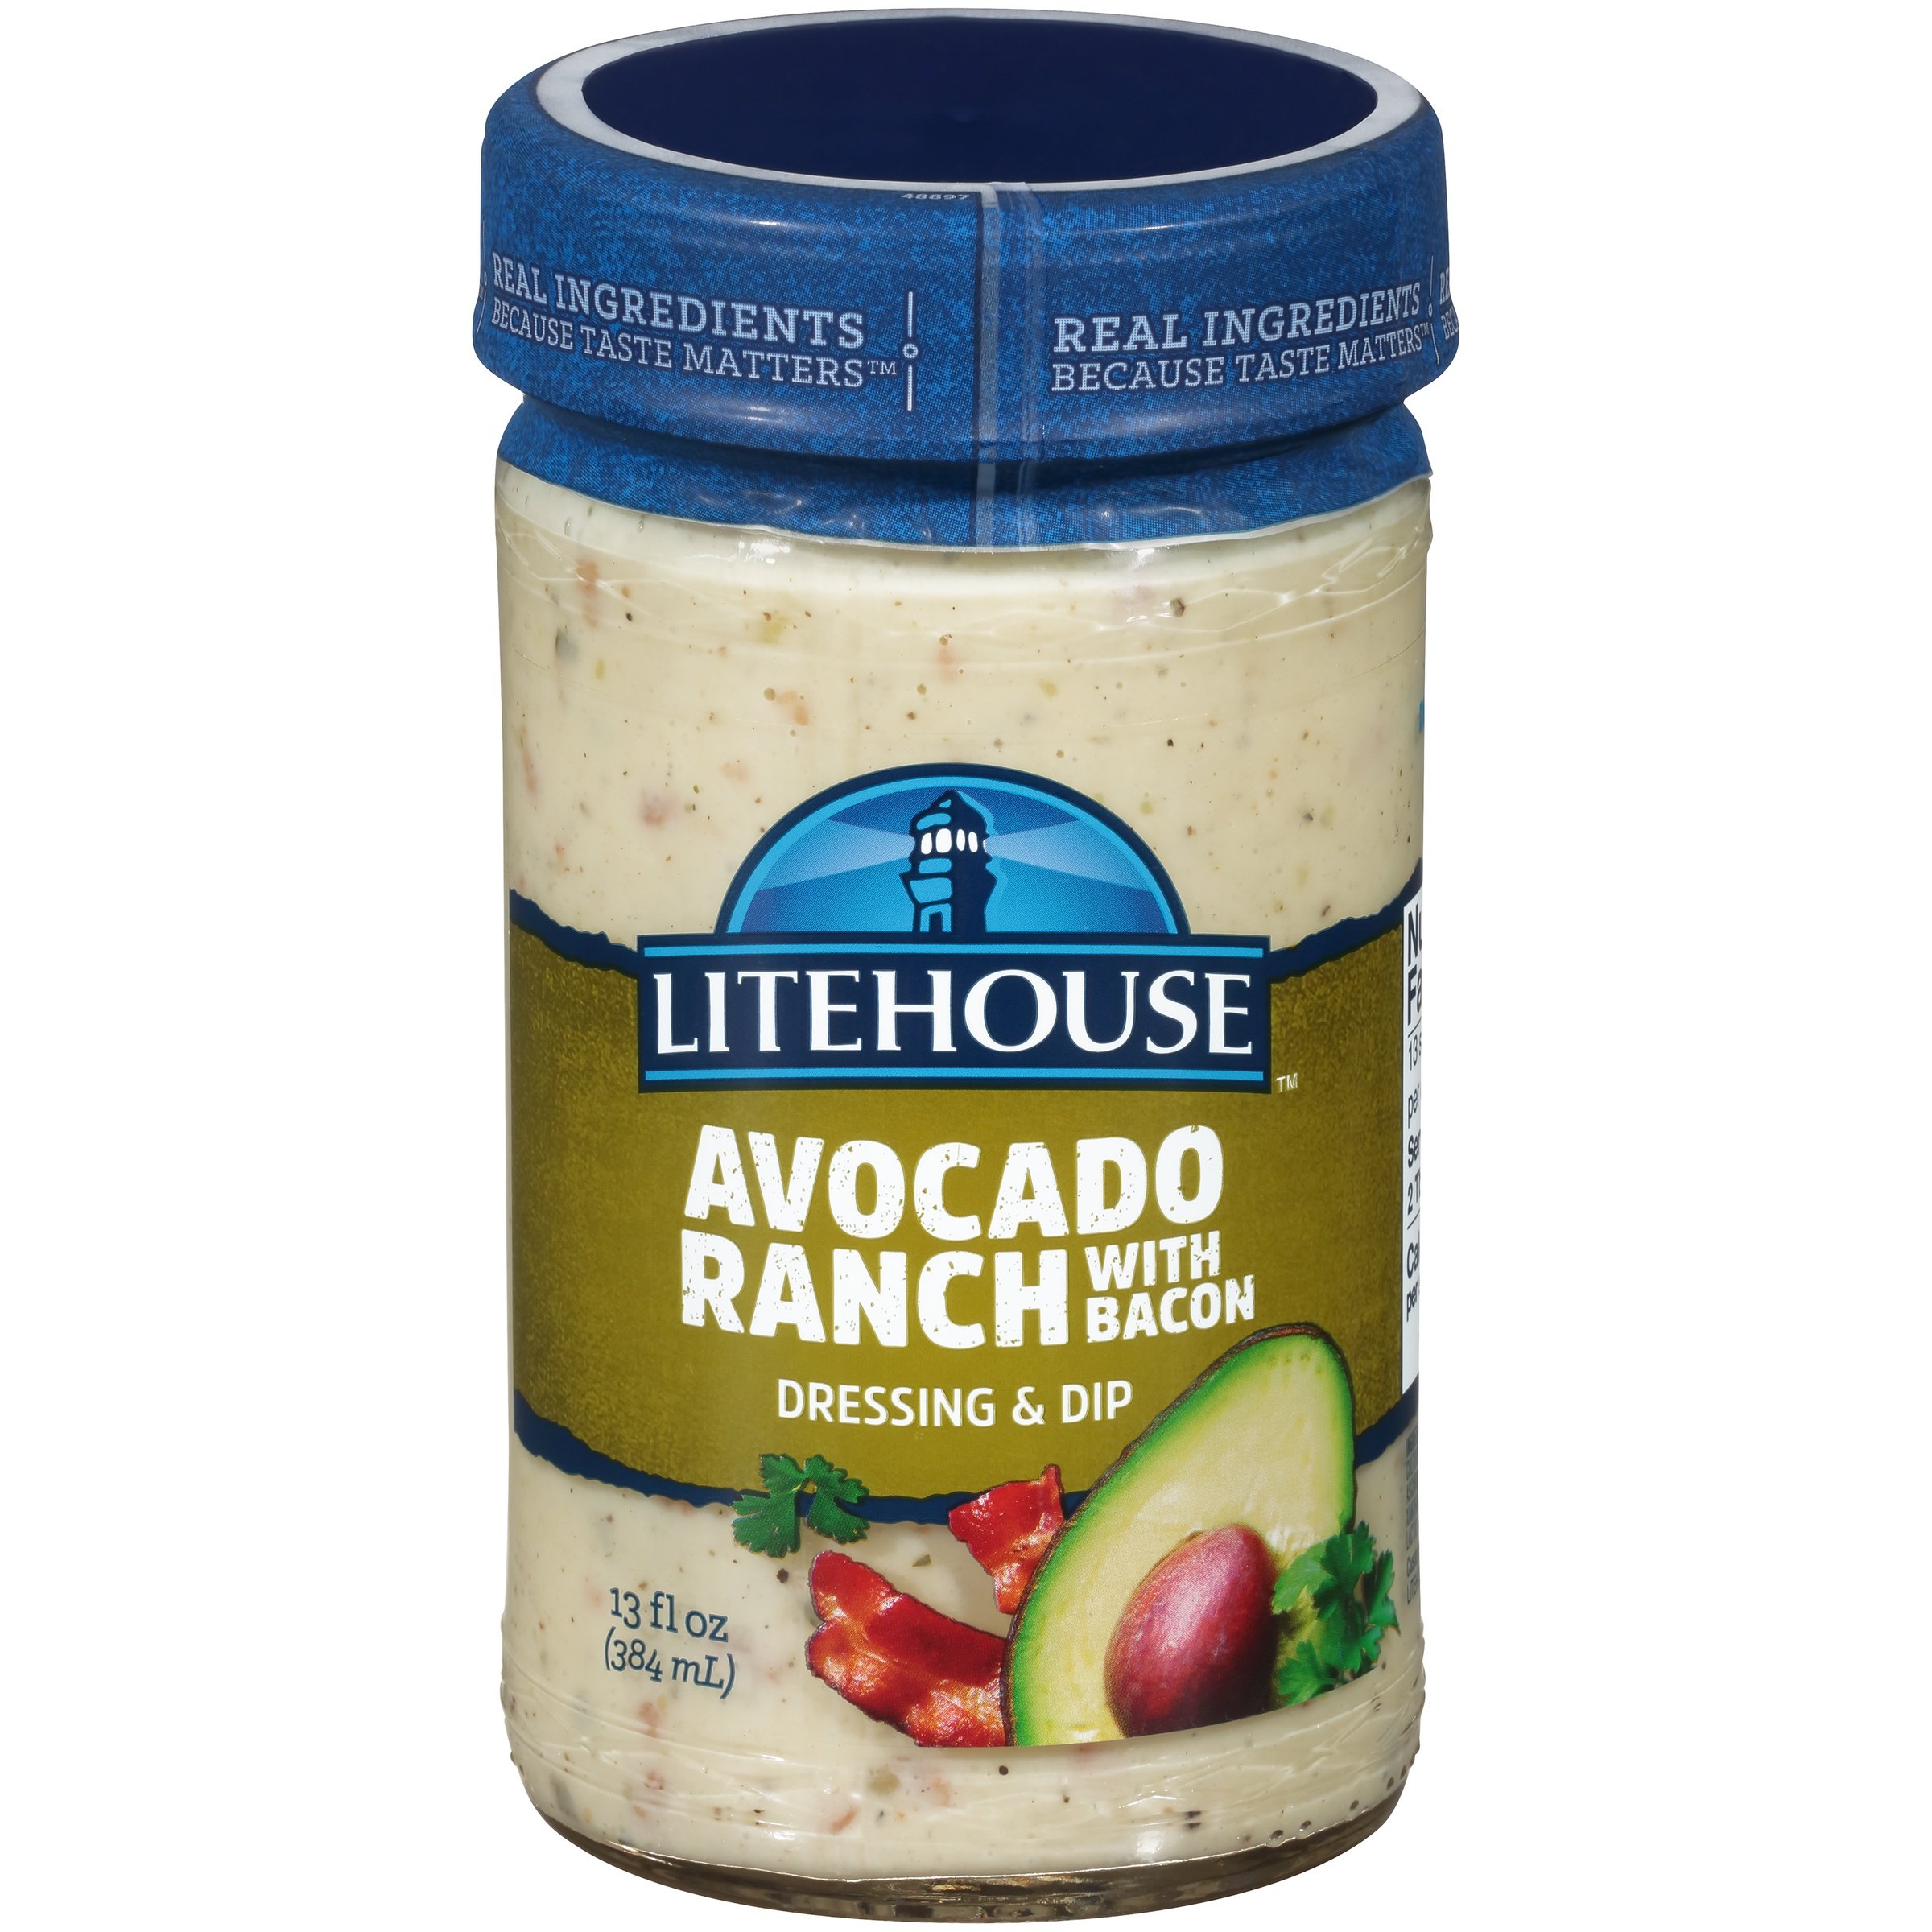 Litehouse® Avocado Ranch with Bacon Dressing & Dip 13 fl. oz. Bottle